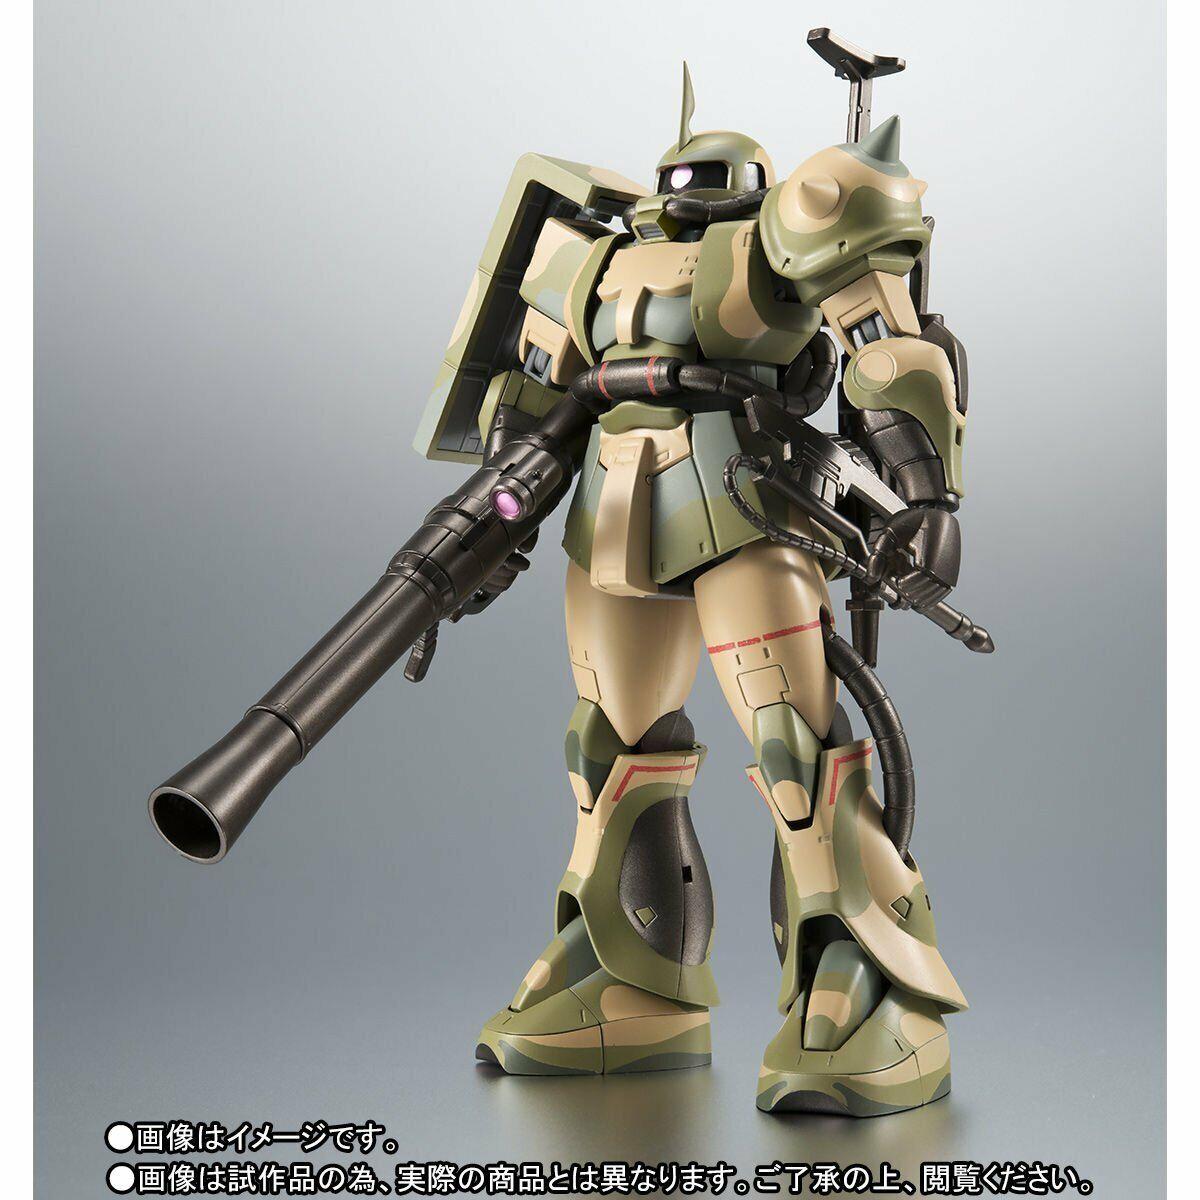 Bandai Robot Spirits lado MS MS-06J Zaku humedal tipo Ver. A. n.i.m.e.